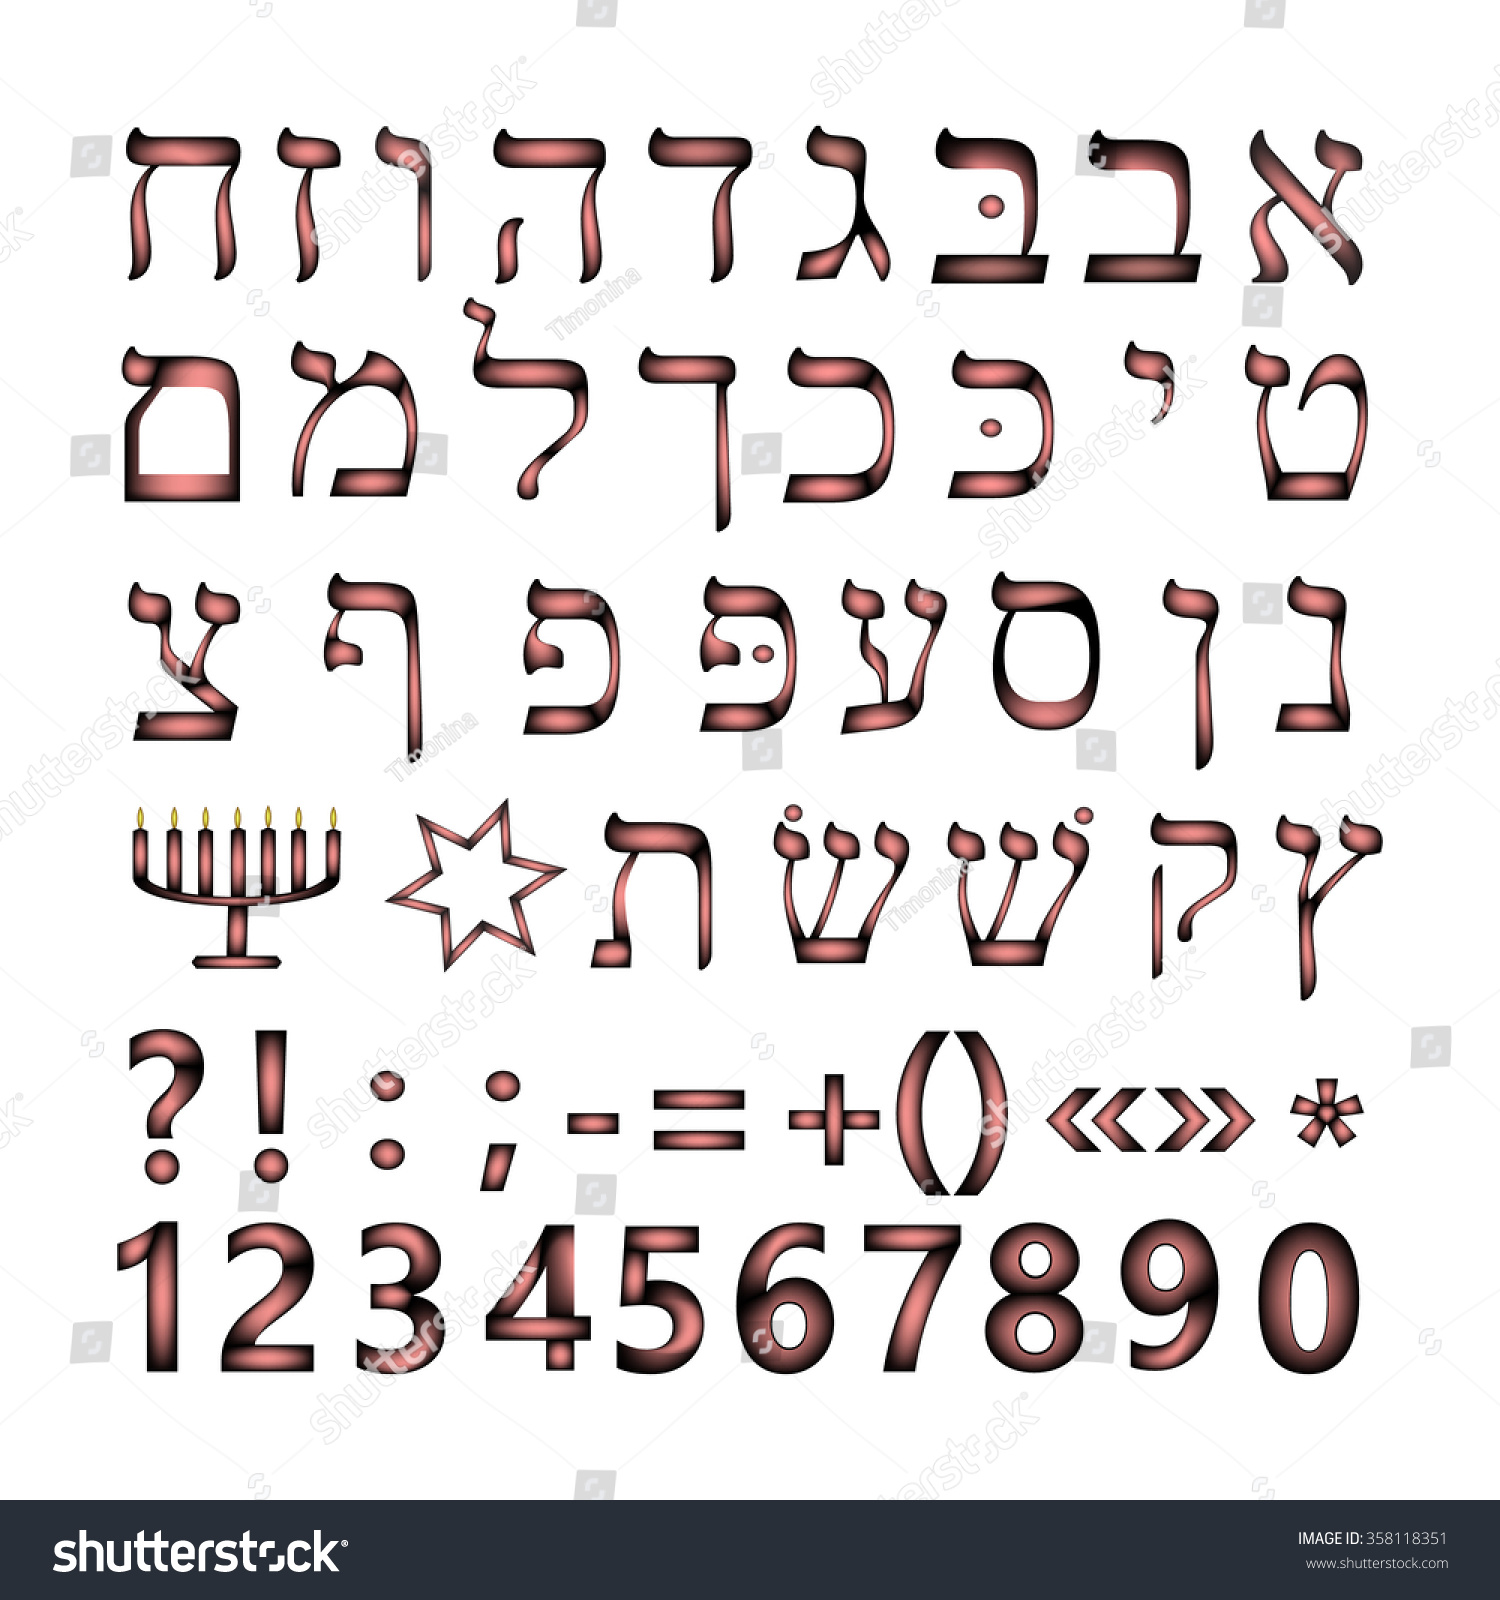 Hebrew font hebrew language figures number stock vector 358118351 the hebrew language the figures number jewish symbols star biocorpaavc Image collections